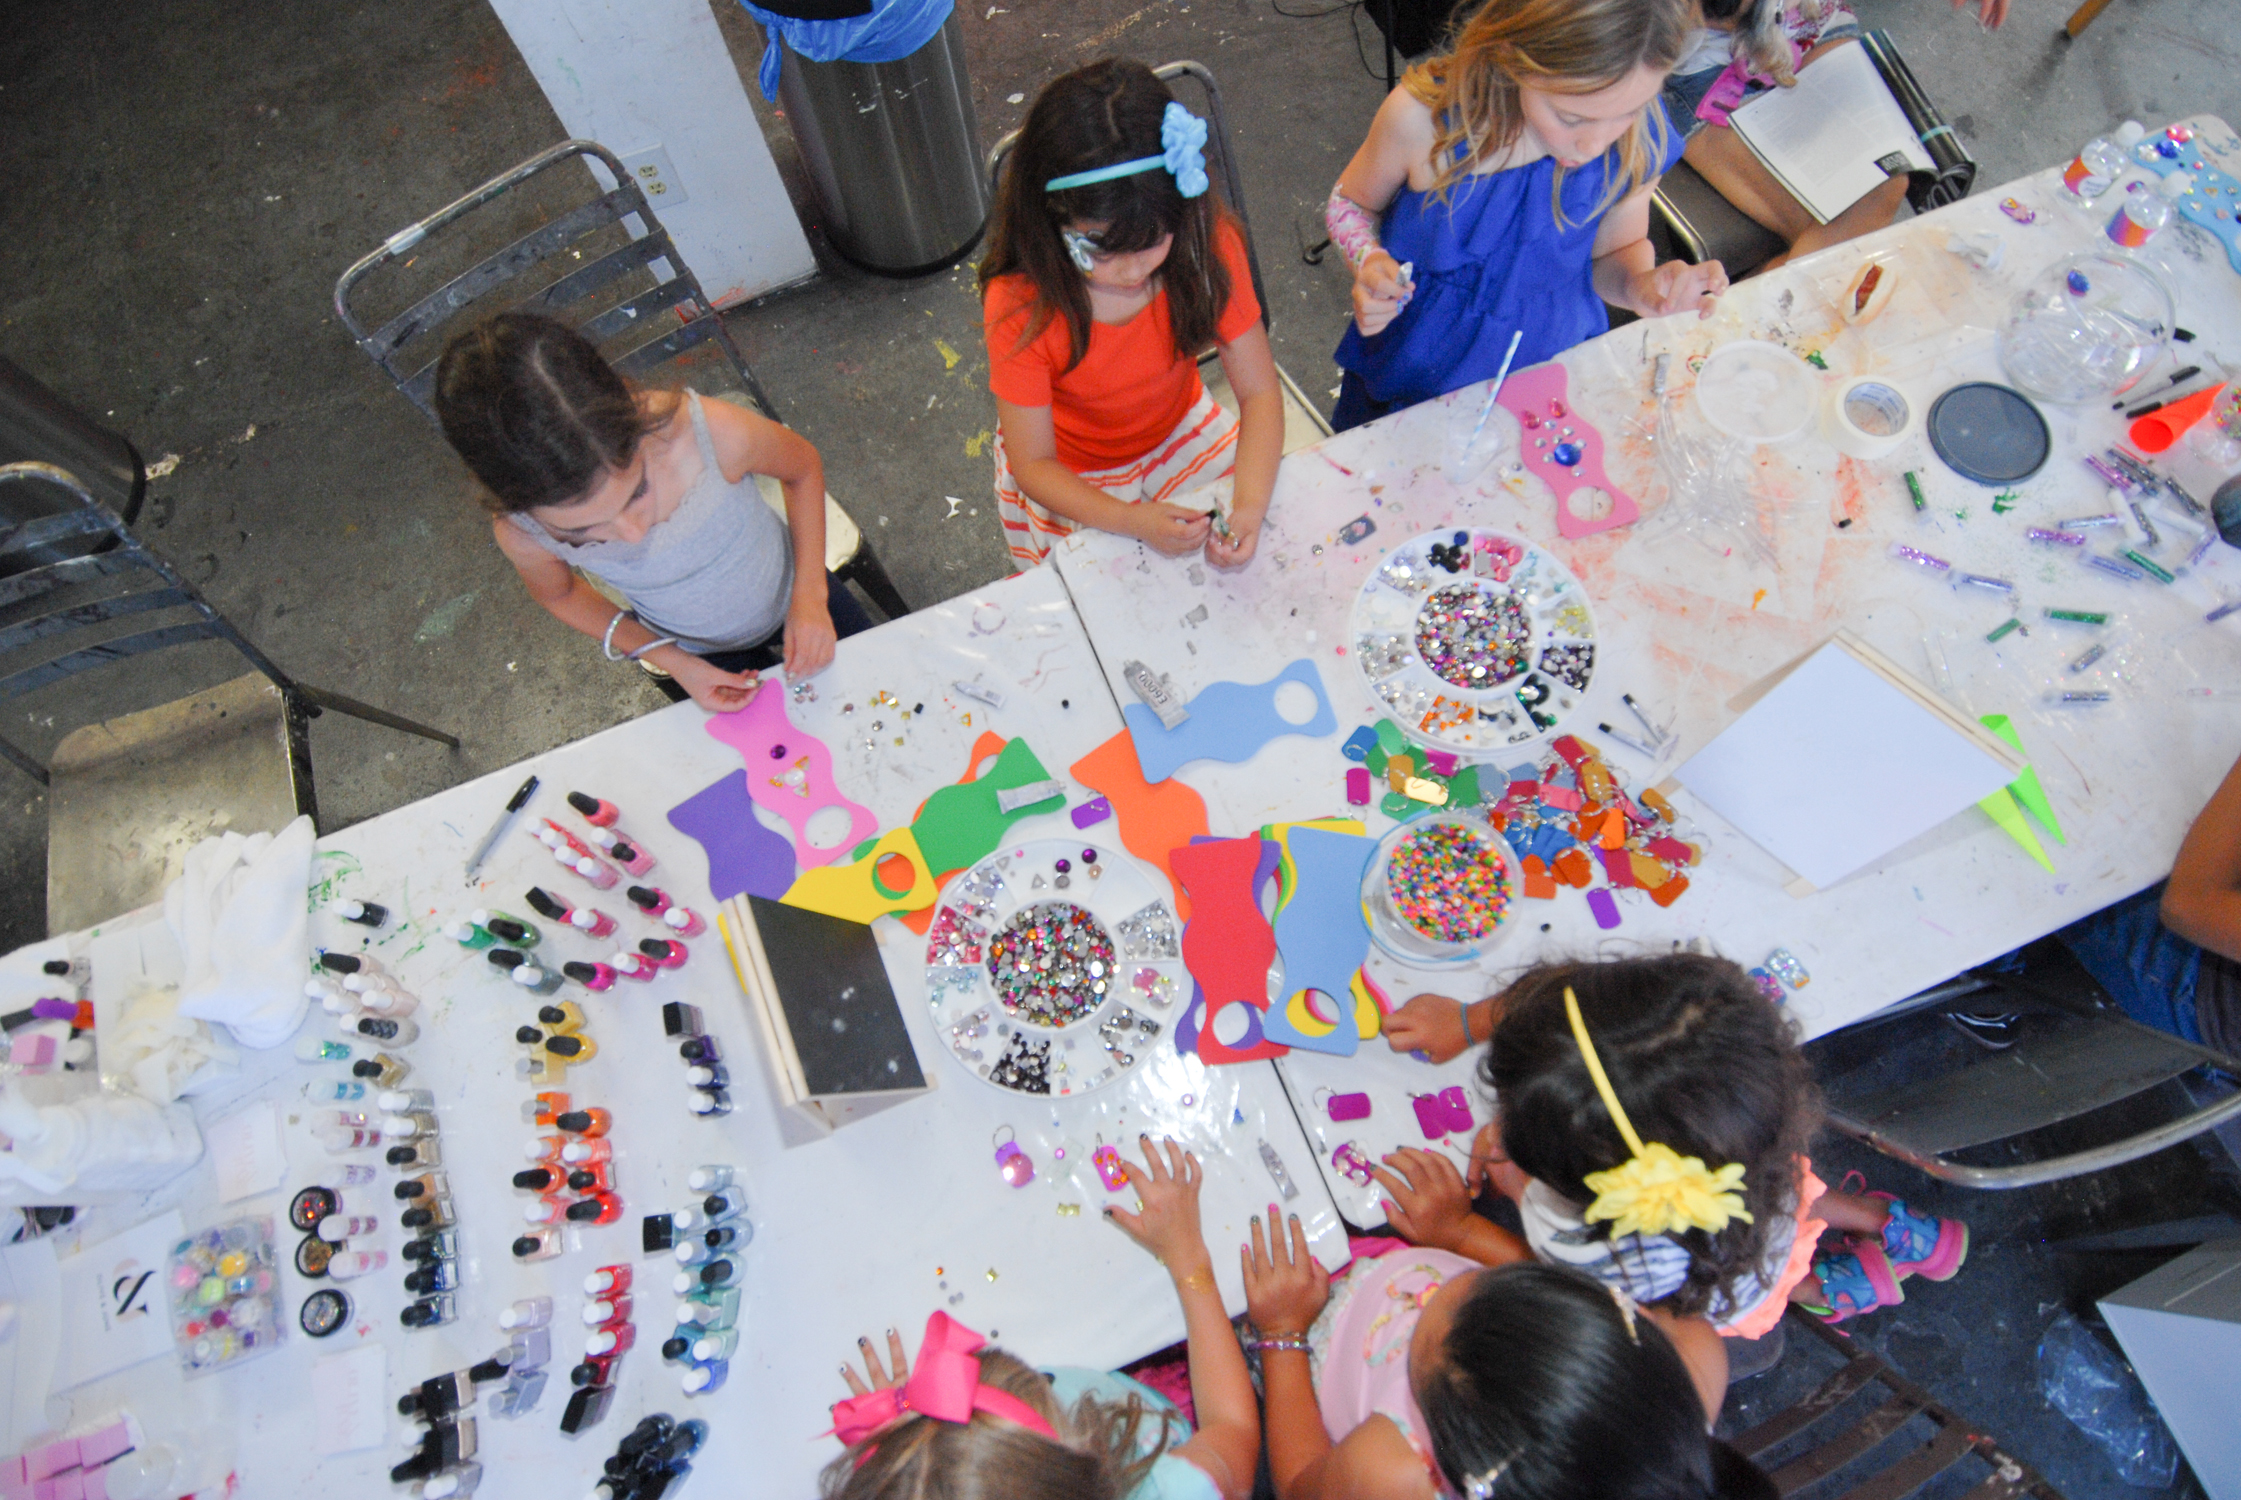 tarynco-events-kids-party-art-carnival-themed-artsandcrafts-station.jpg